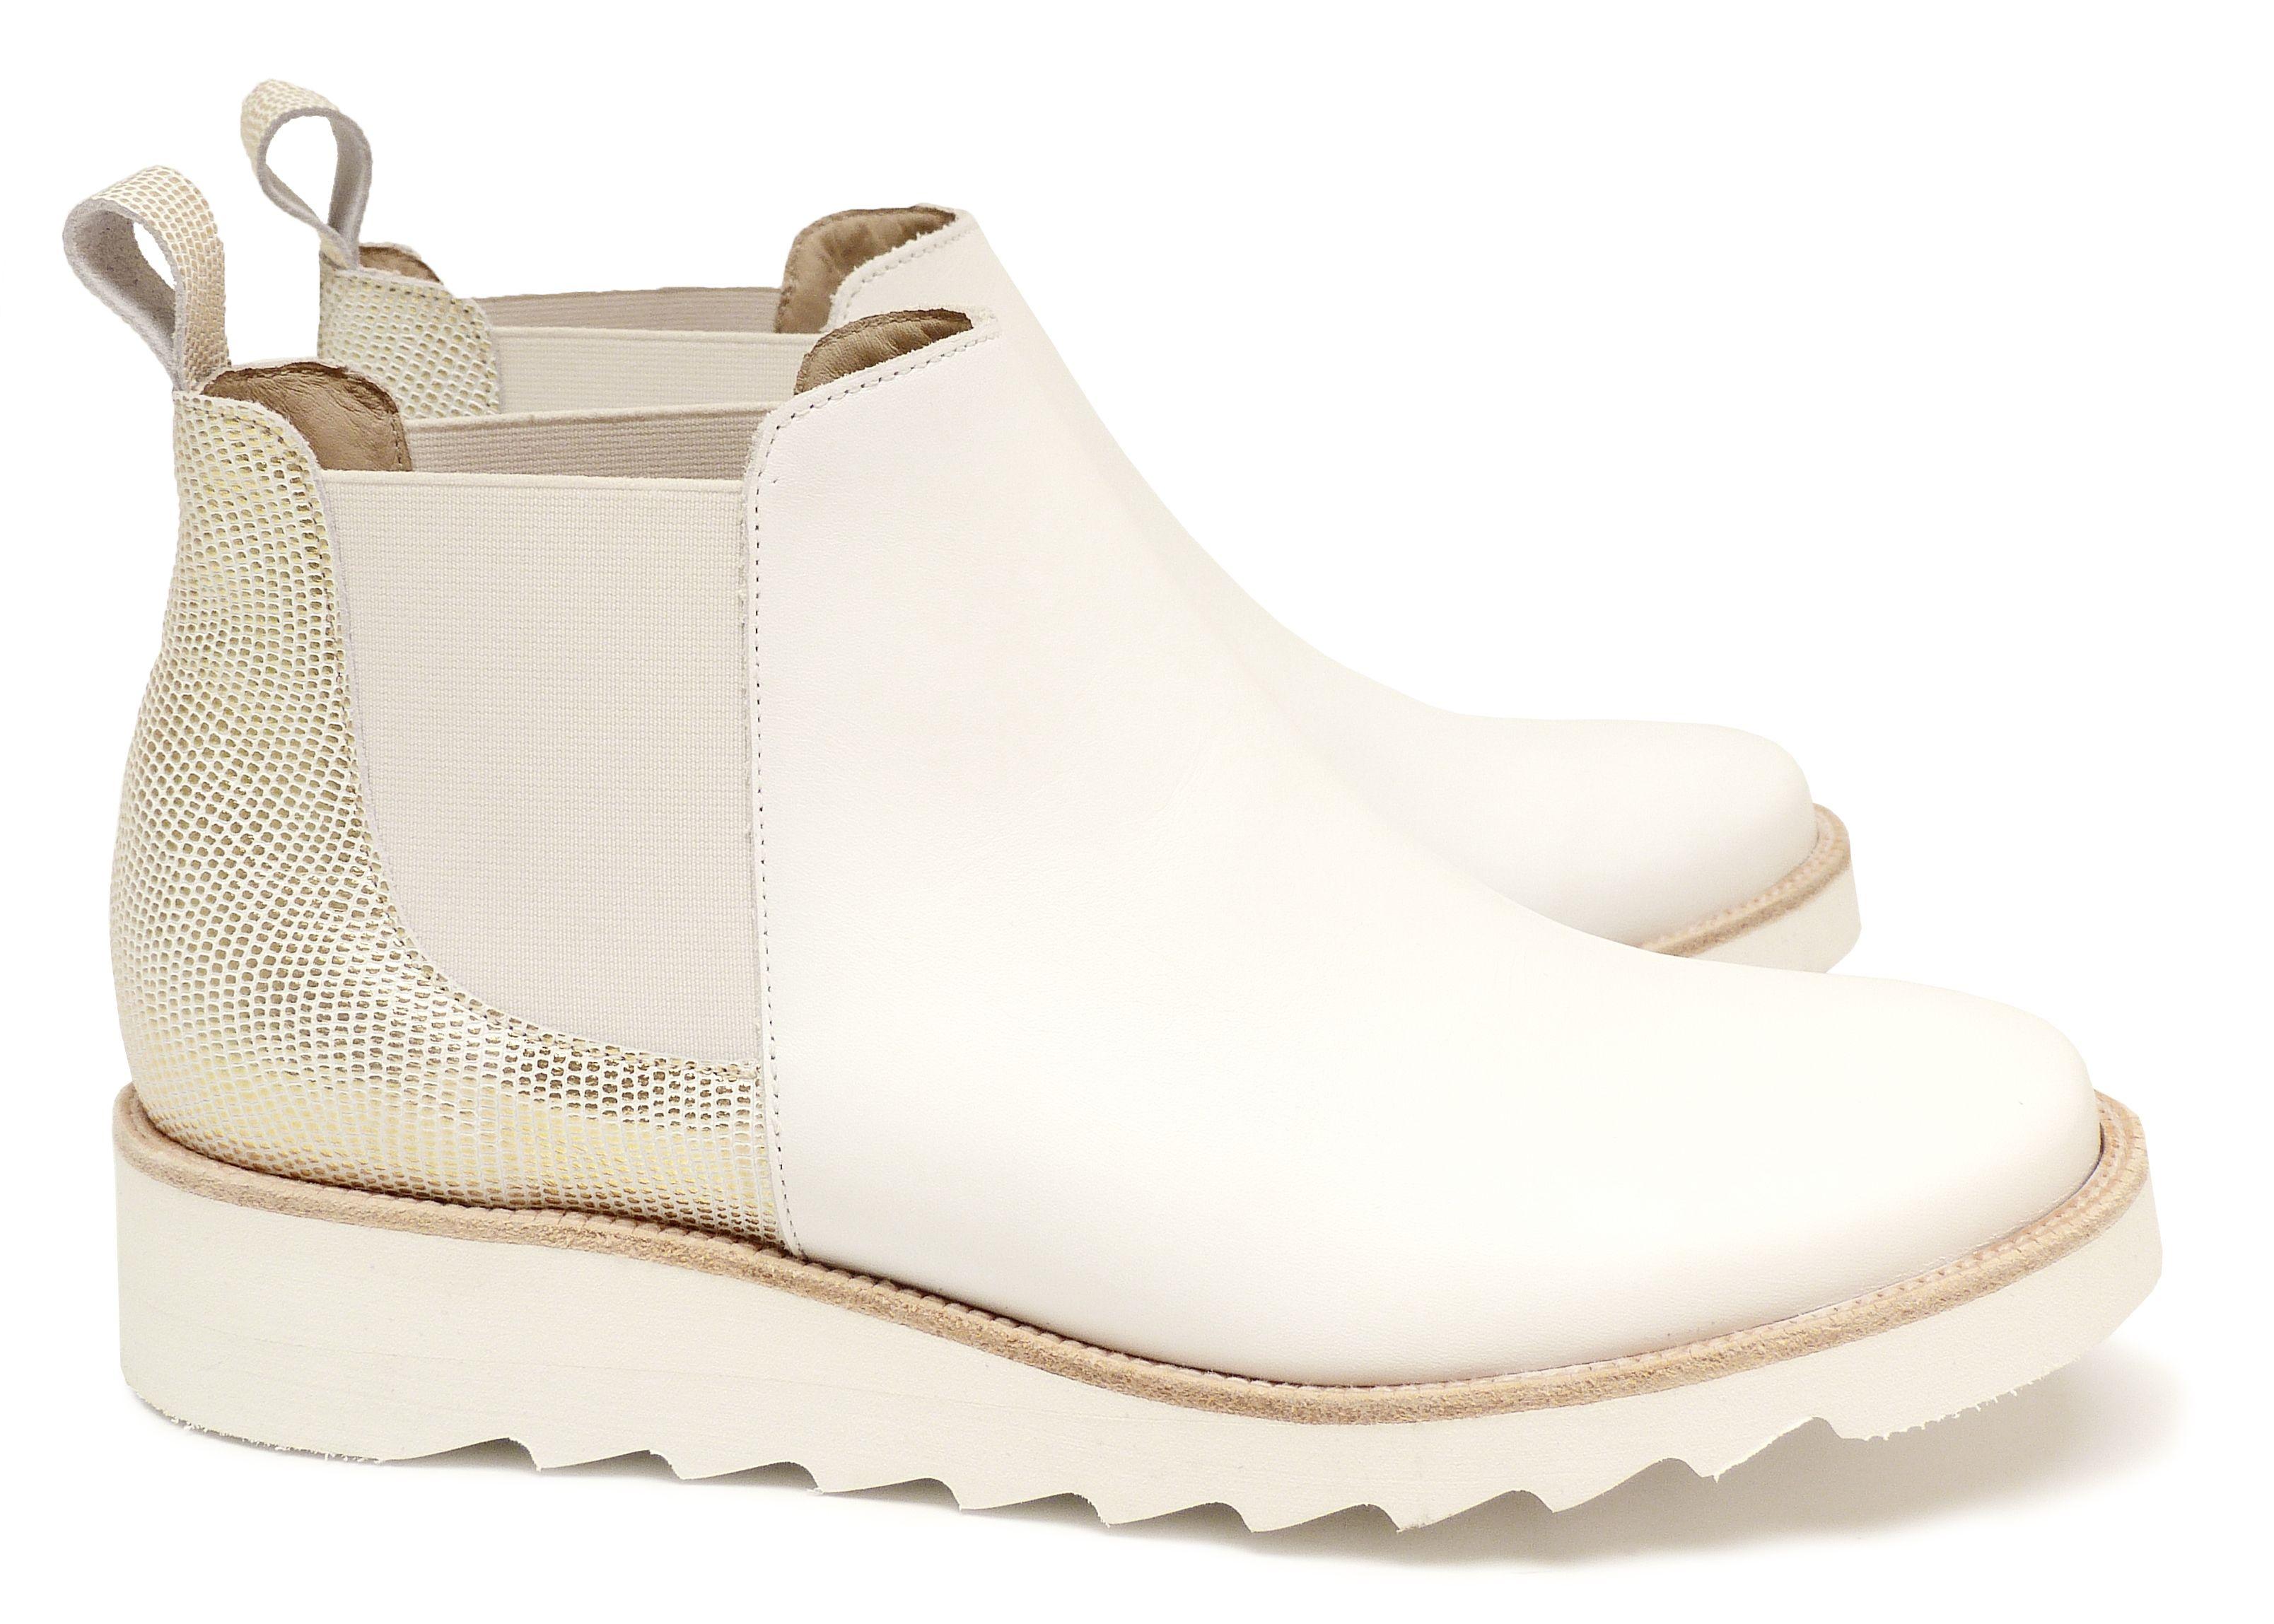 621b39d5824 Chaussure Femme Boots Printemps Ete 2015 Maurice Manufacture BRENDA Cuir  lisse Blanc - Razza Or